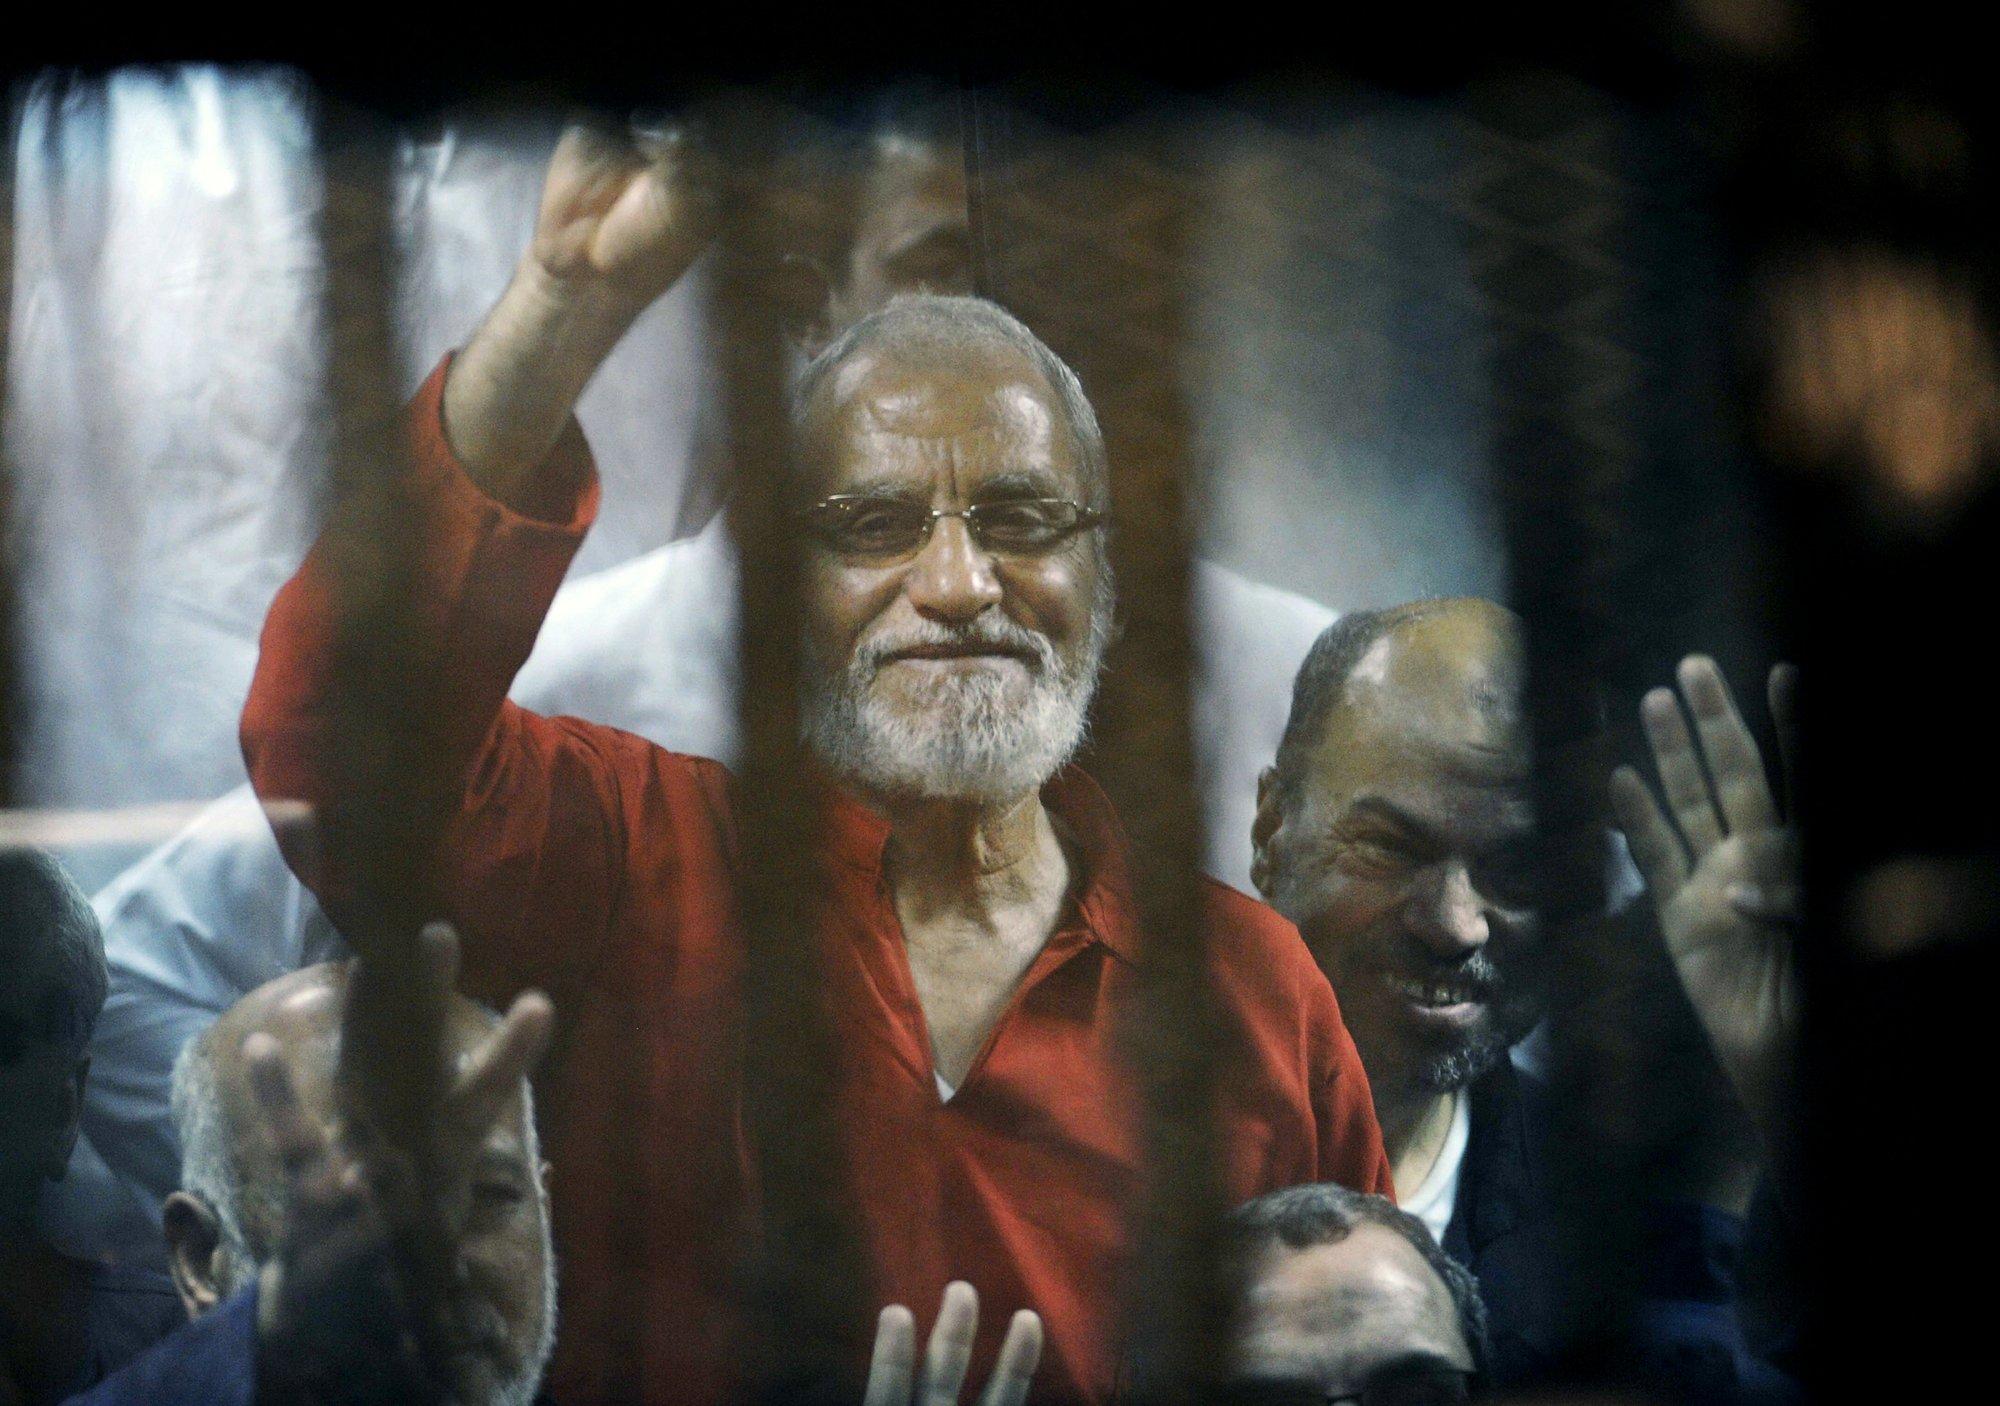 Egypt sentences 11 Islamist leaders to life for spying